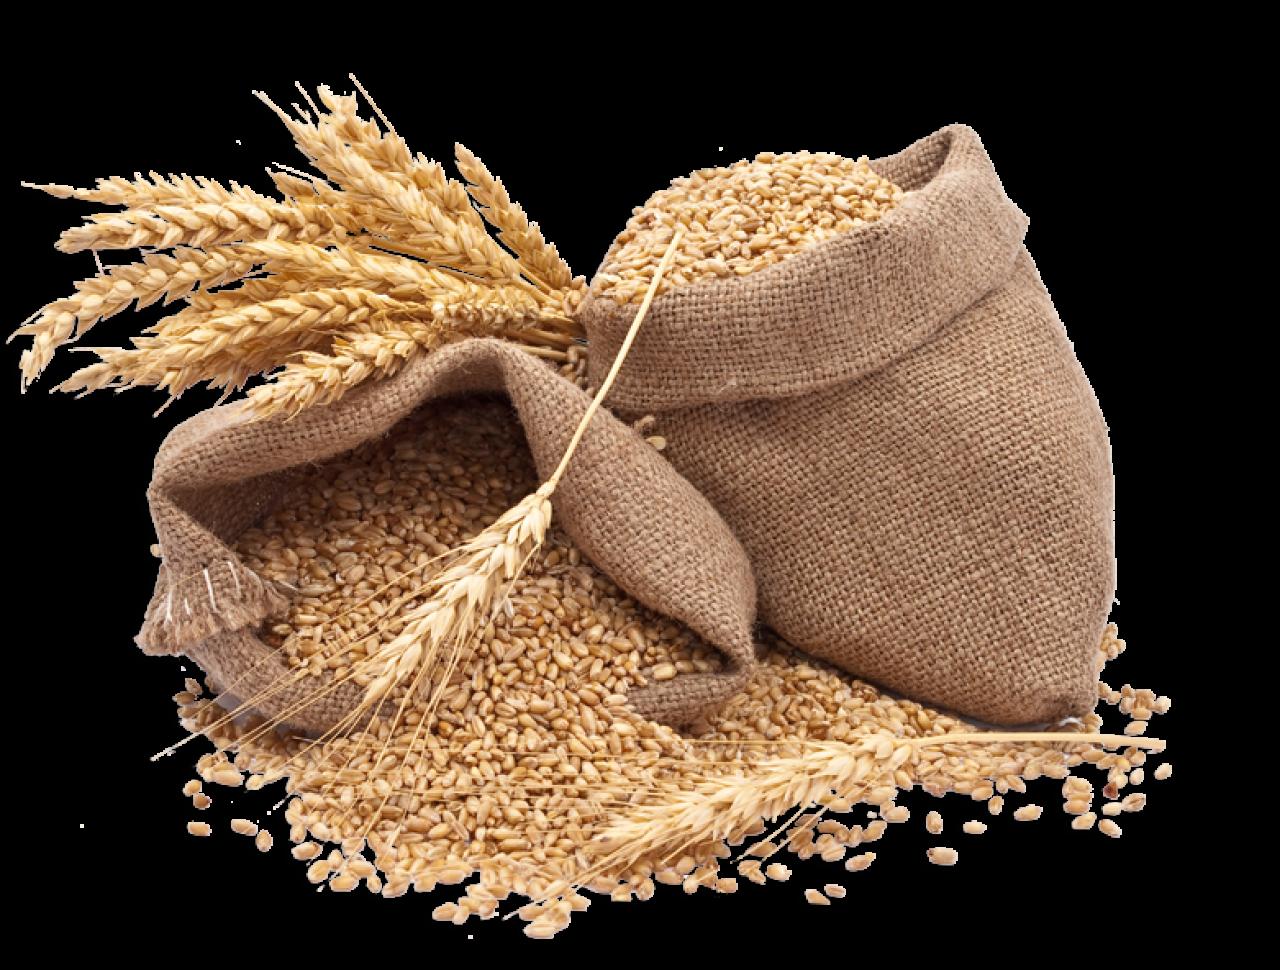 kisspng-cereal-rice-food-whole-grain-wheat-whole-grains-5b5e0575221c51.5453307915328884371397